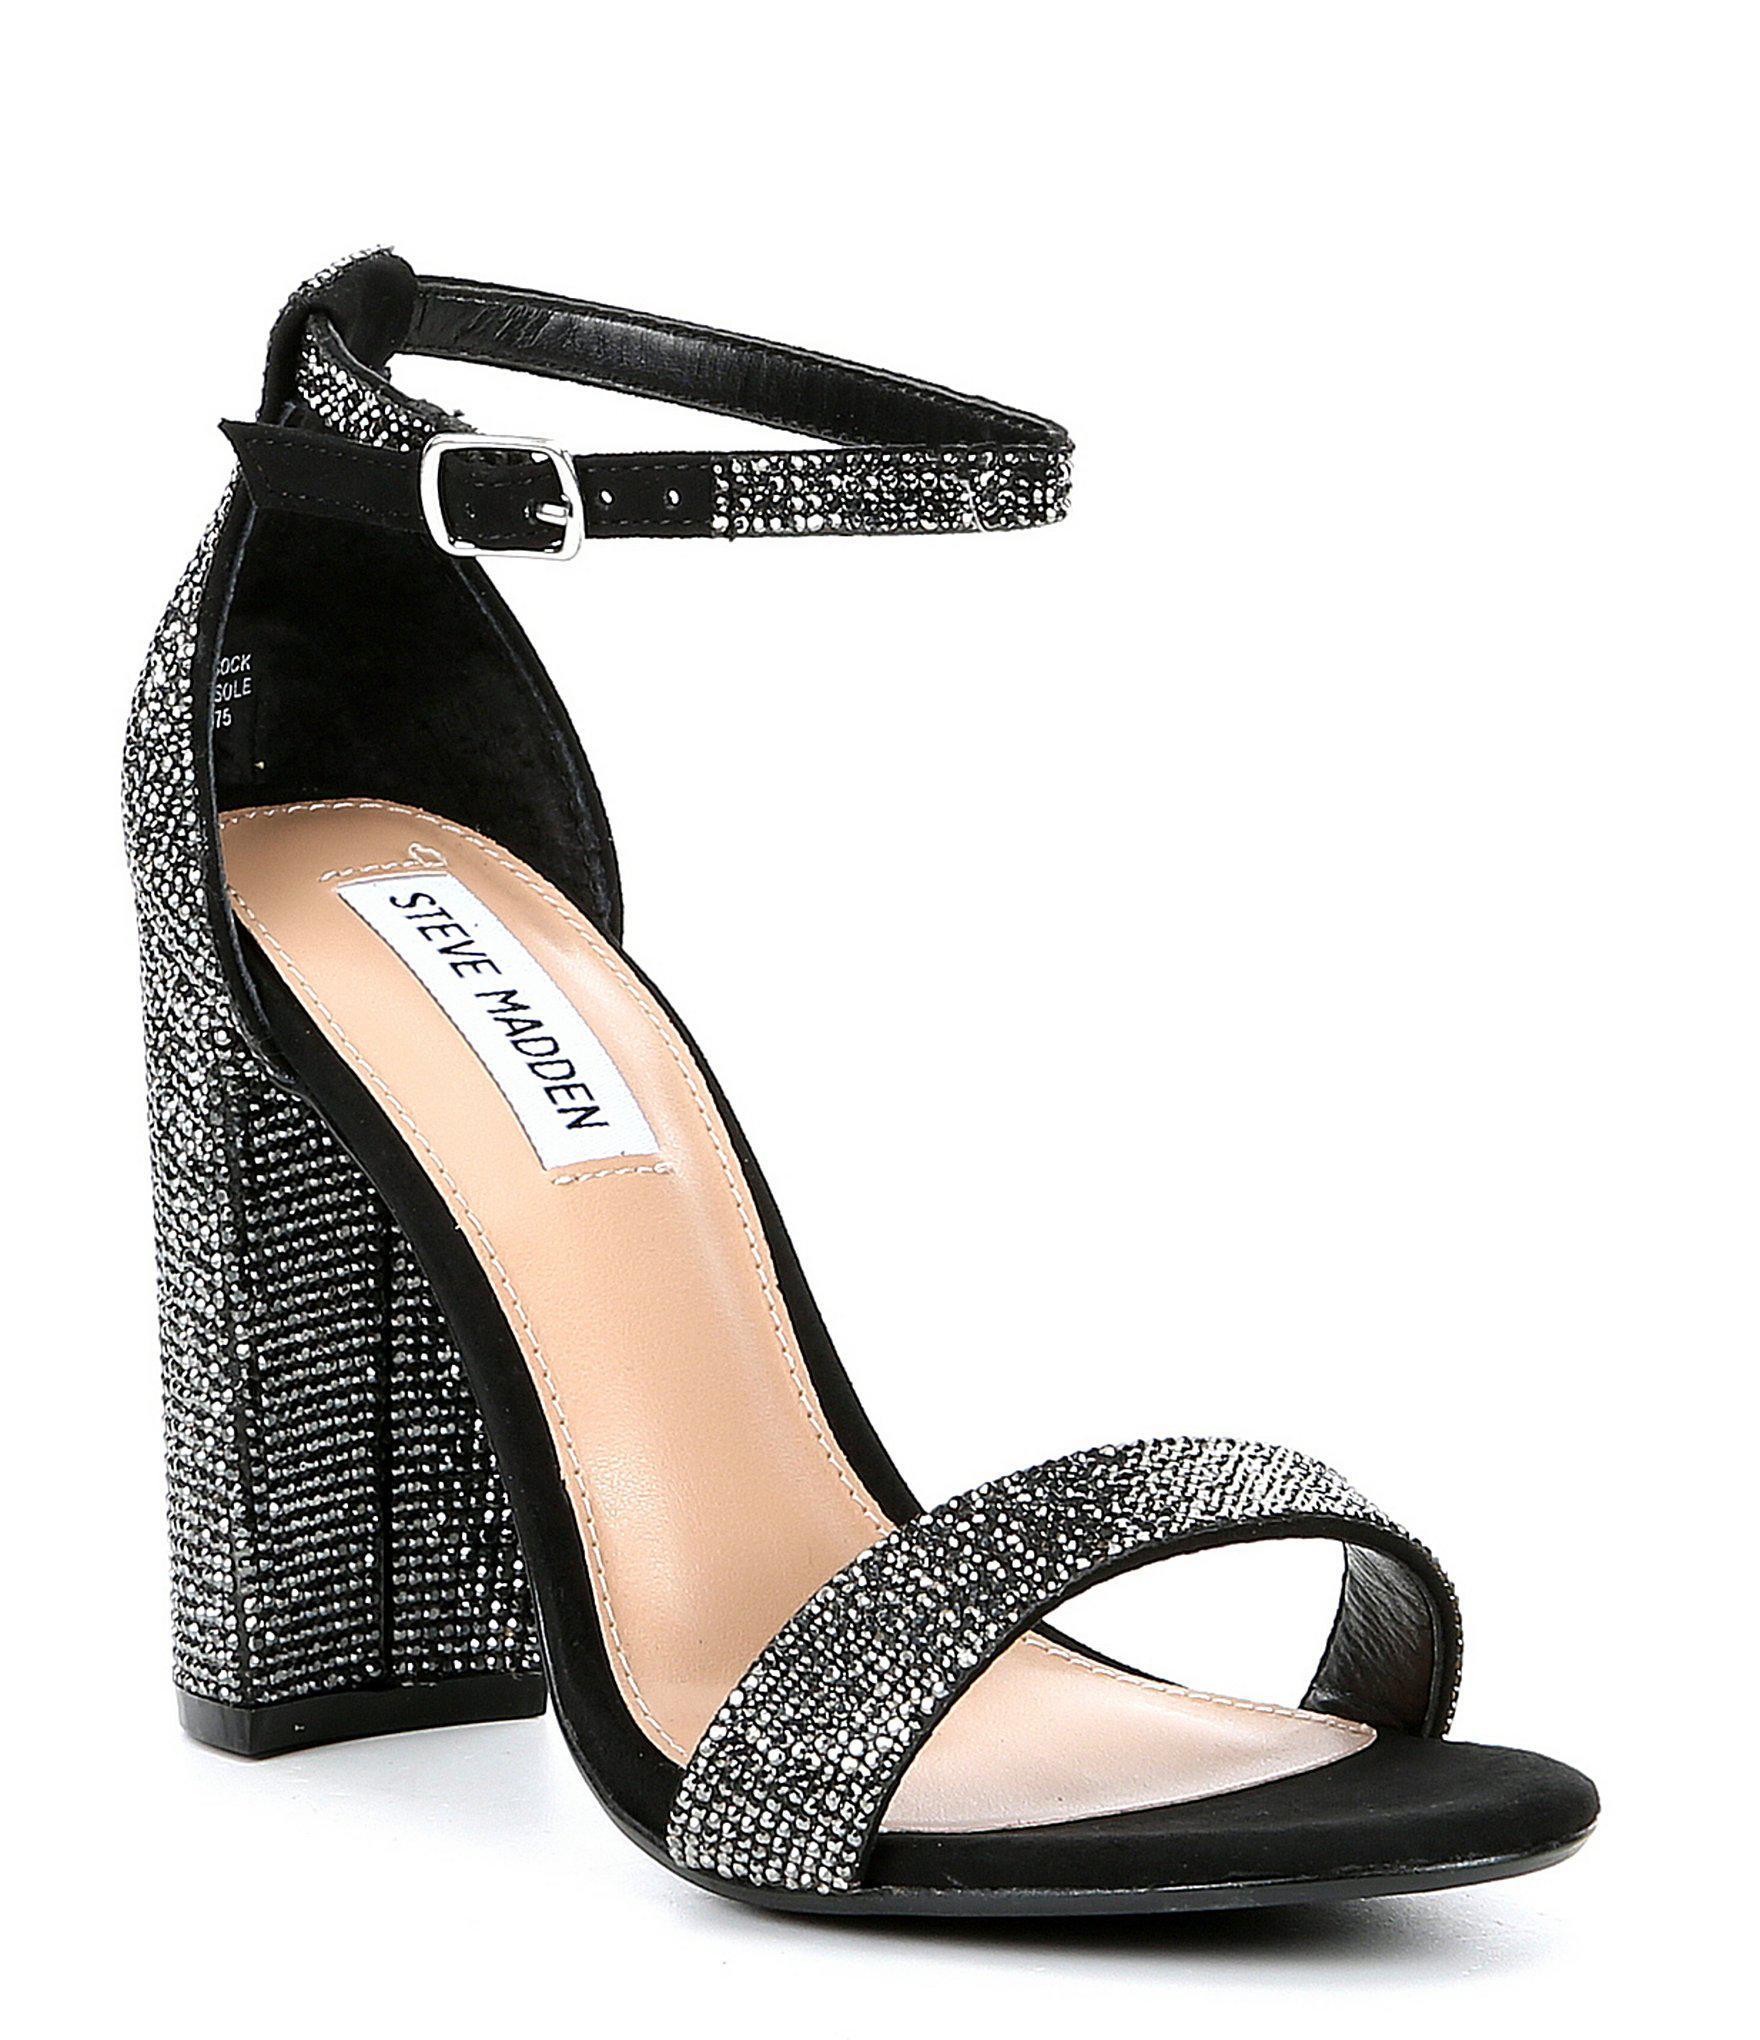 e0ef59a9d732d Steve Madden. Women s Black Carrson Rhinestone Ankle Strap Block Heel Dress  Sandals